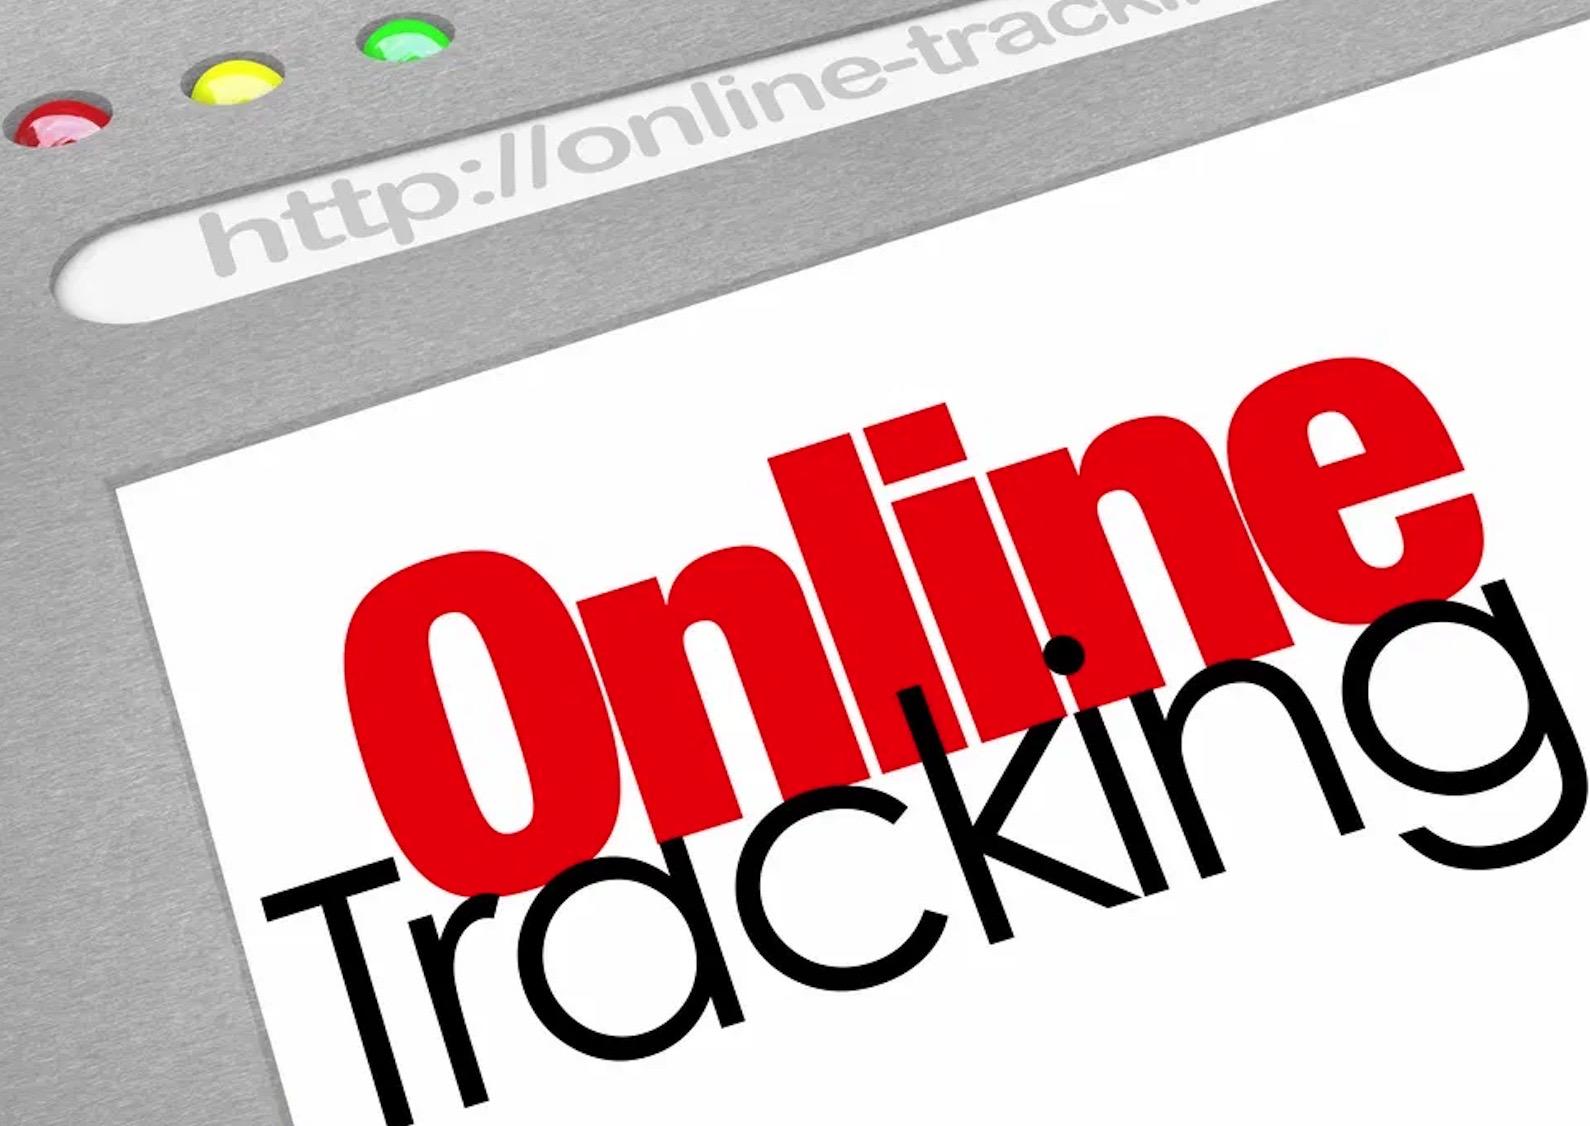 Pharma websites tracking visitors